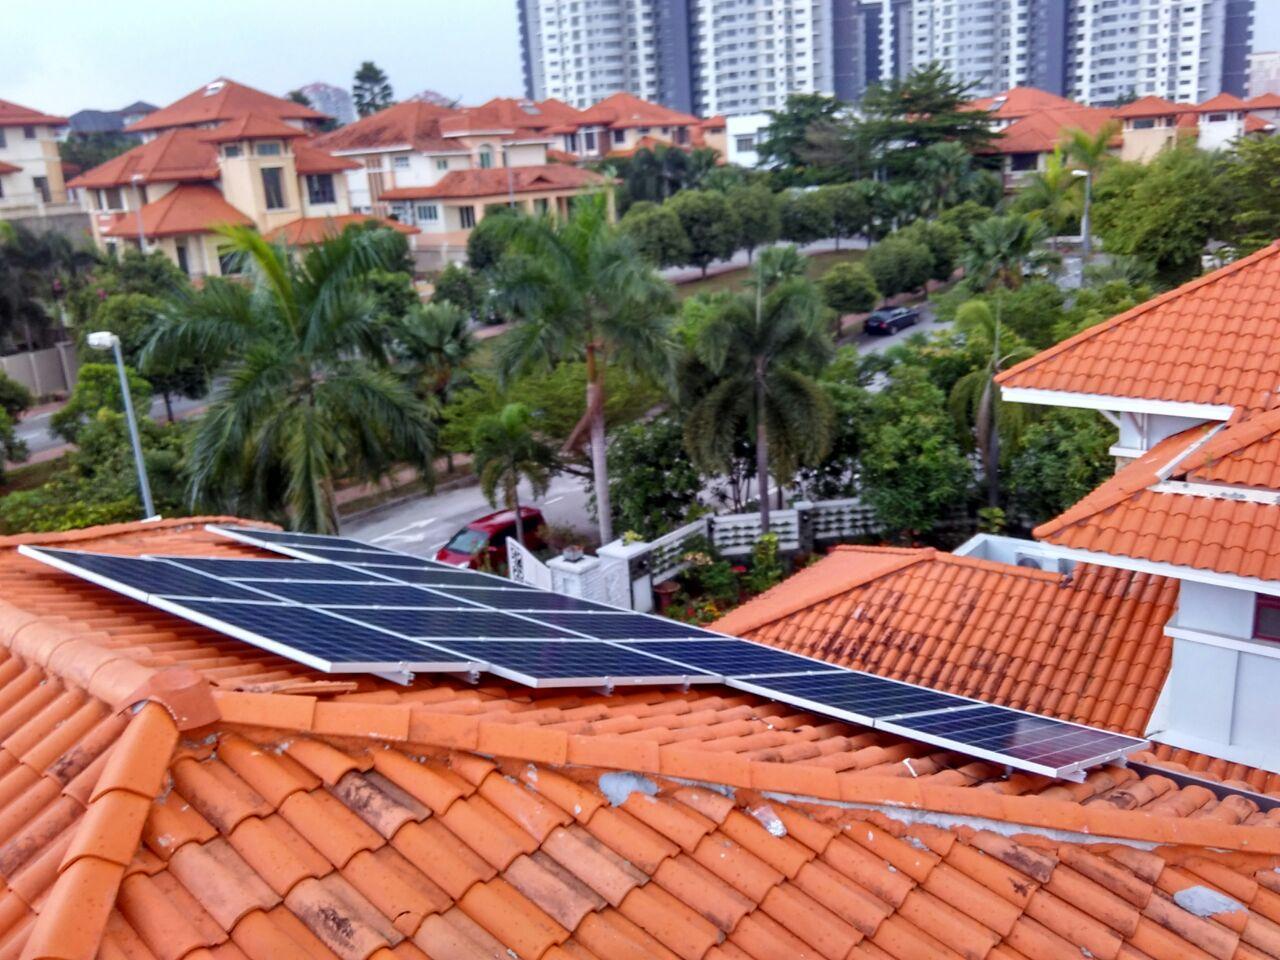 3. Global Kiara Sdn Bhd (12kW with 1kW lithium battery storage) (1)